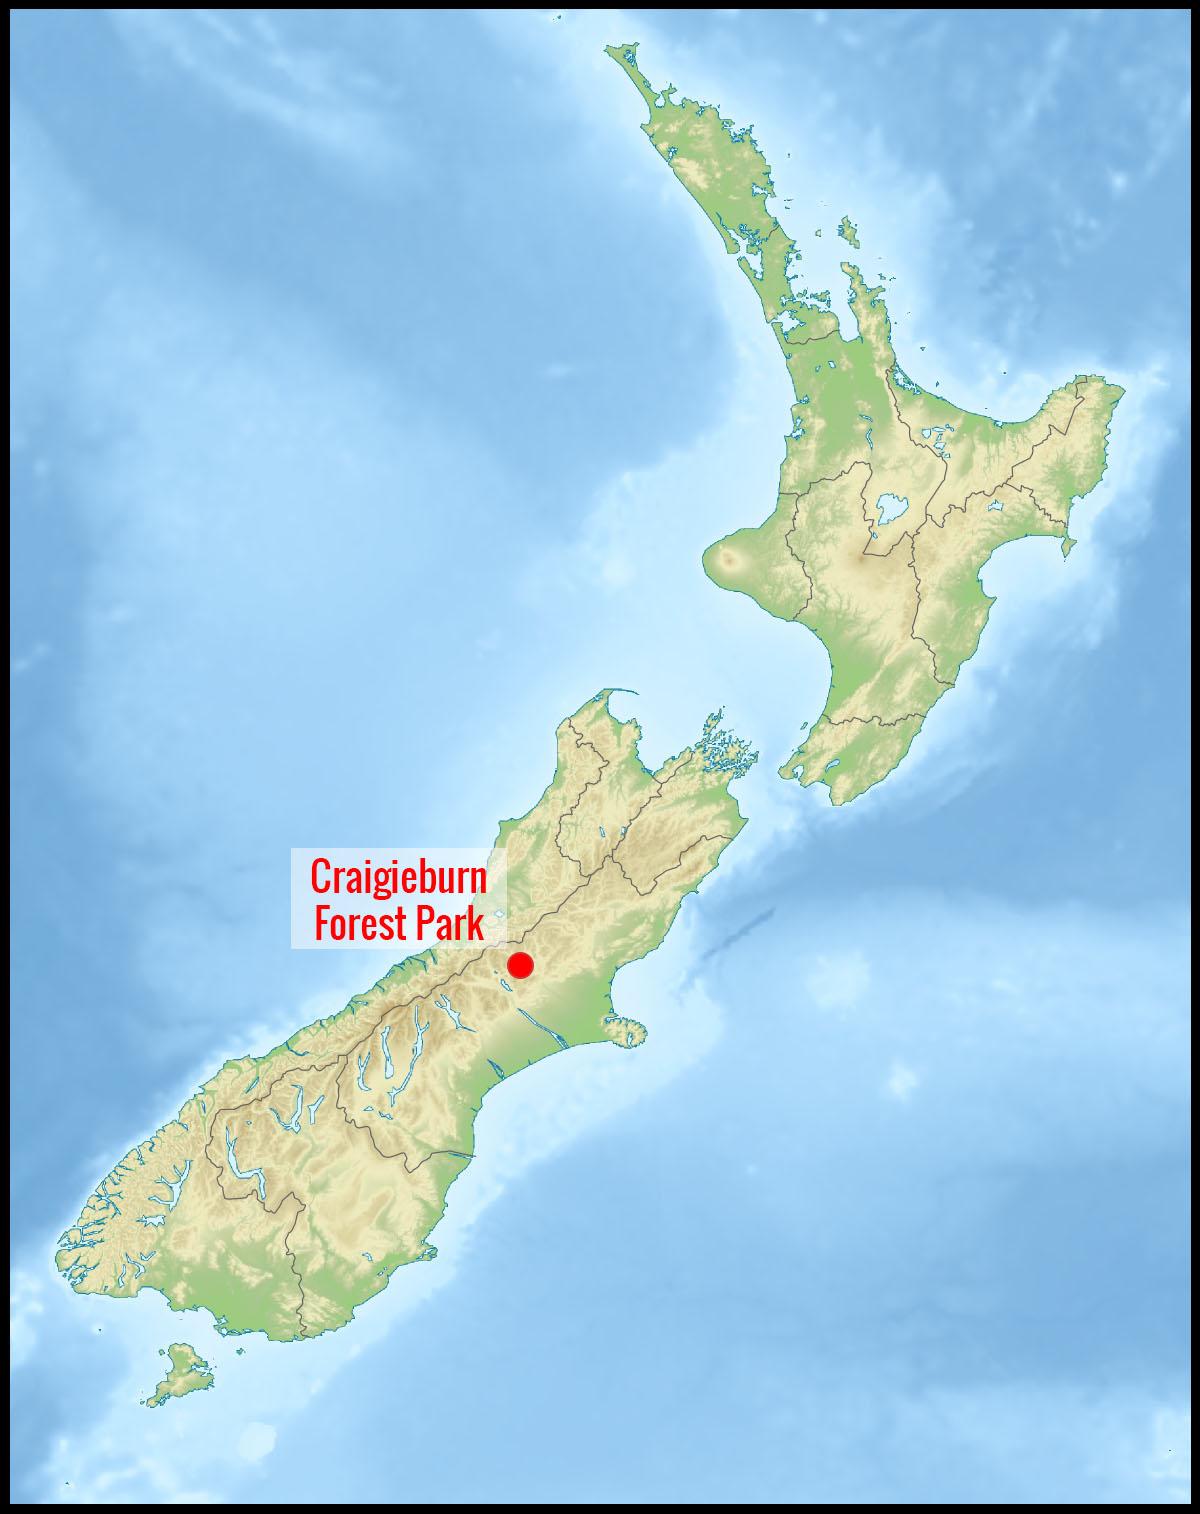 Carte Craigieburn Forest park en Nouvelle-Zelande